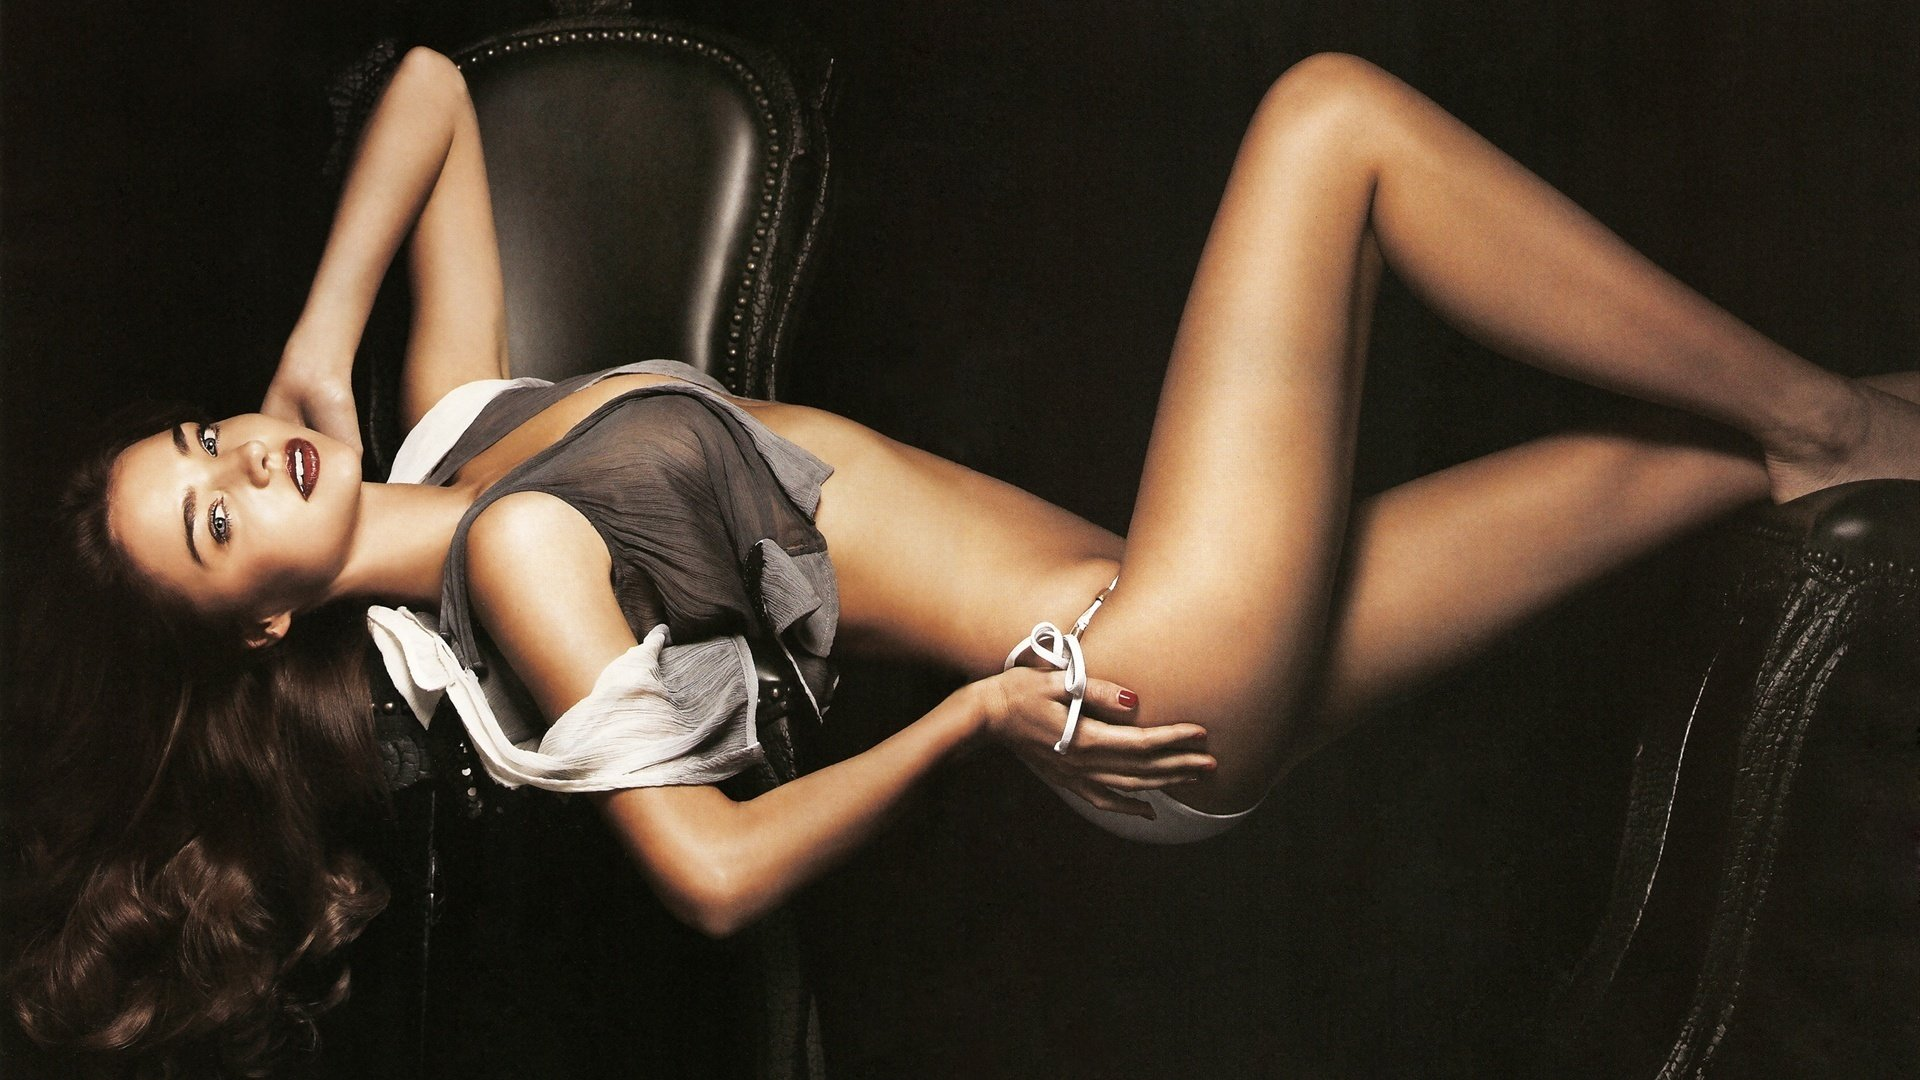 Hd Wallpapers Of Hot Babes, Hollywood Actress I Beautiful Girls Bikini Model Photos Santabanta